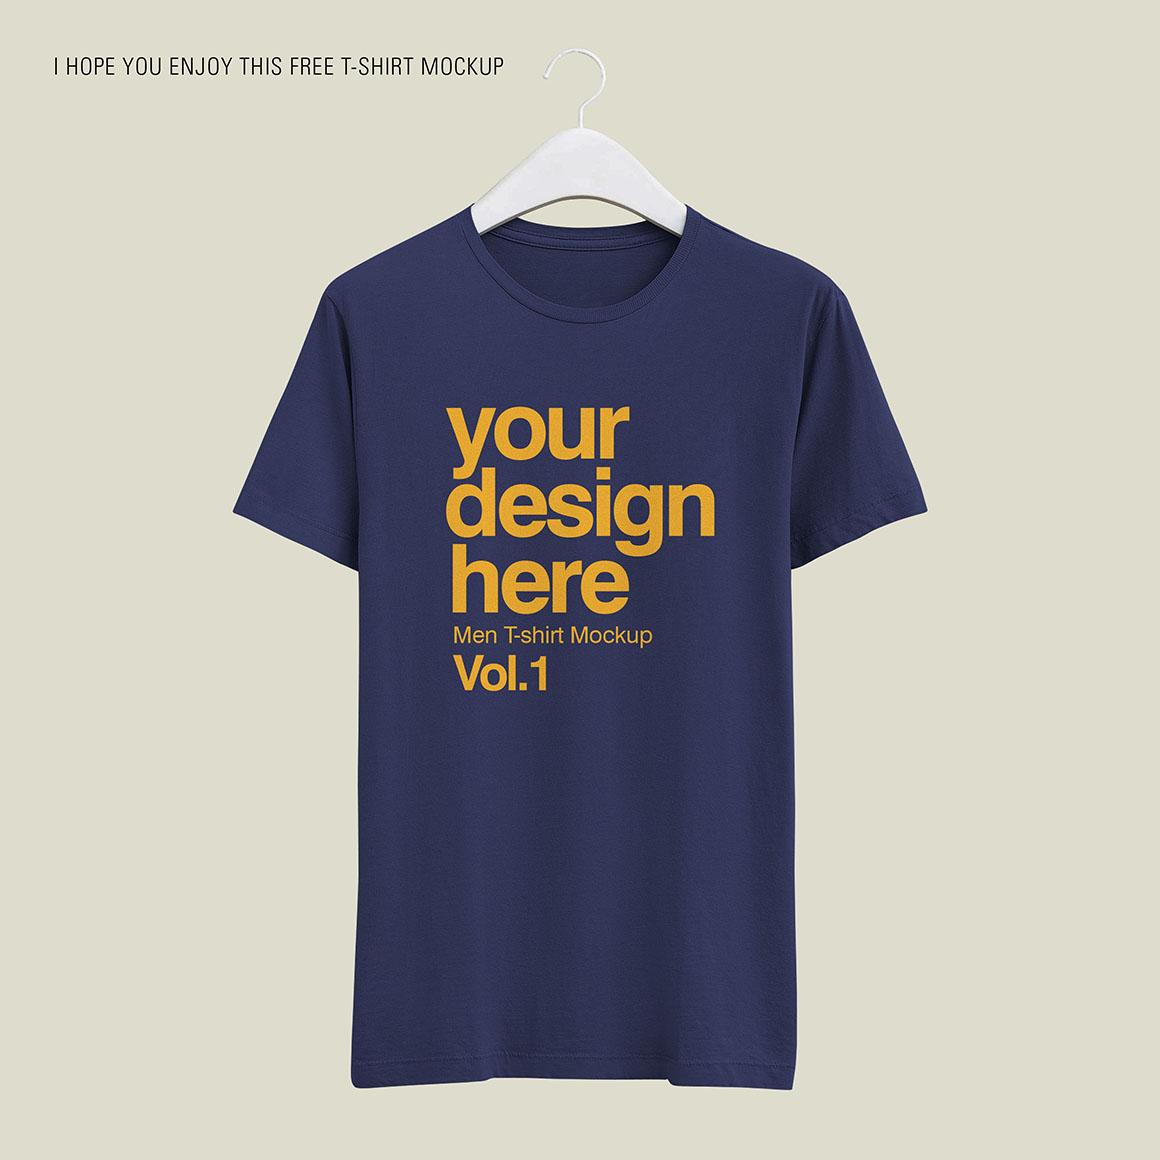 mockup camiseta tshirt gratis designe